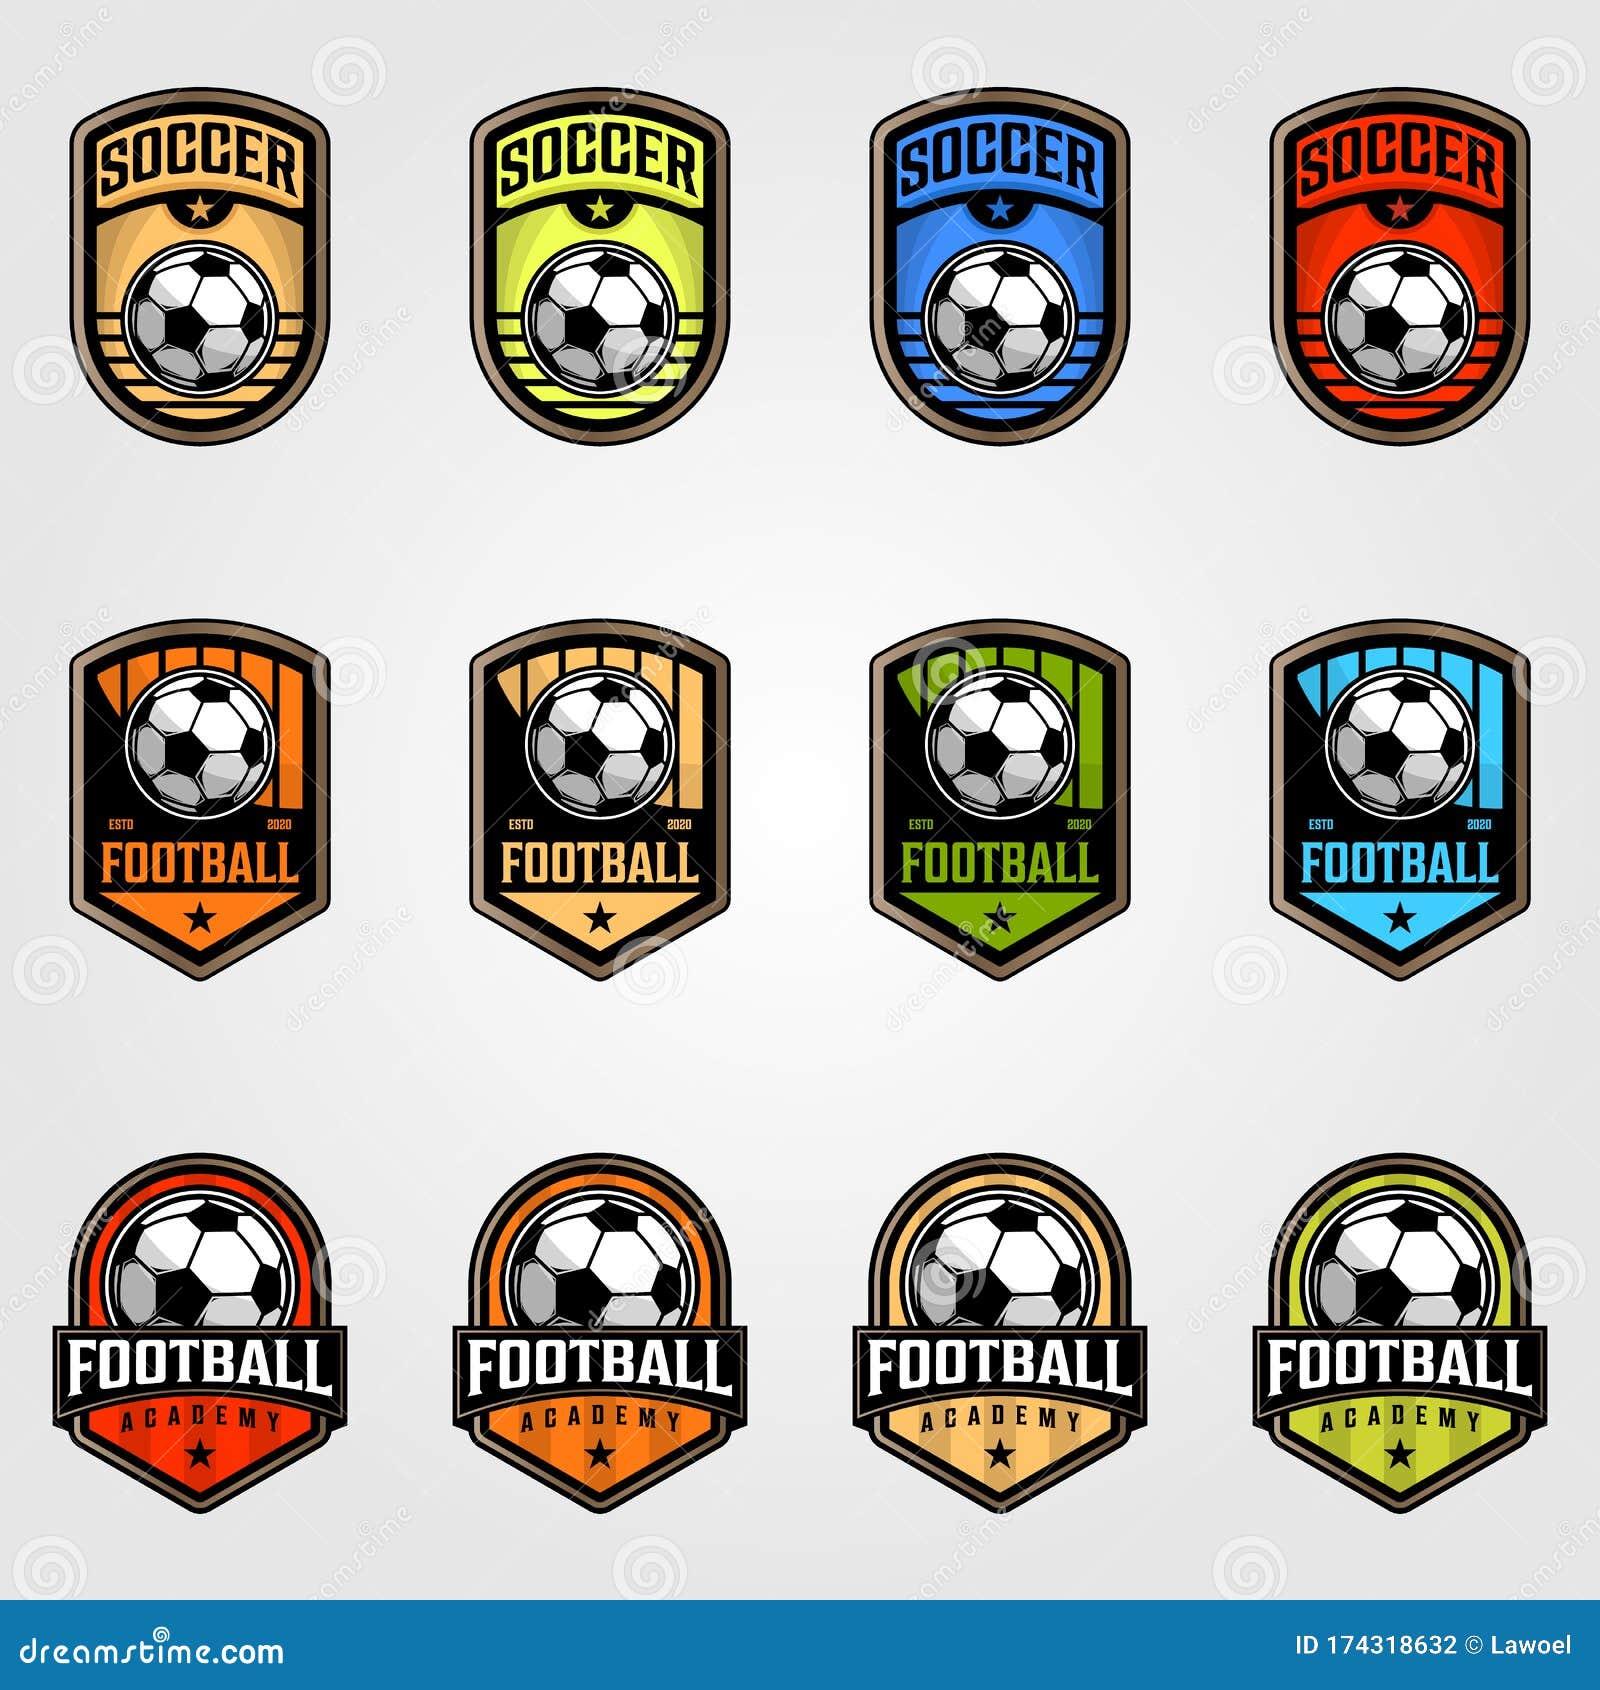 futsal logo stock illustrations 61 futsal logo stock illustrations vectors clipart dreamstime https www dreamstime com set soccer ball emblem football logo vector illustration image174318632